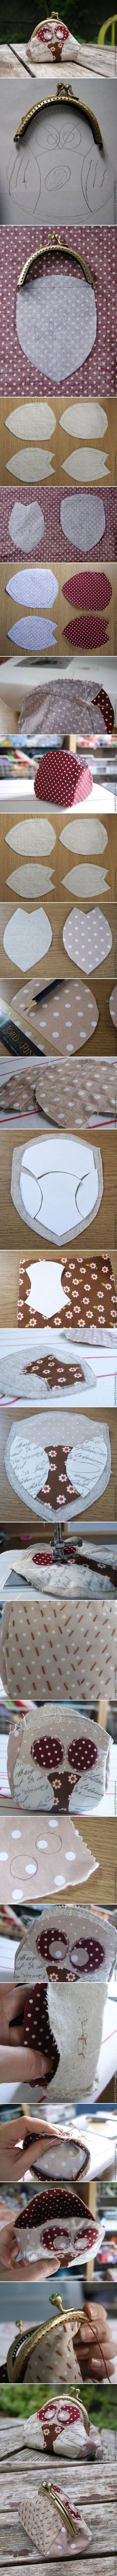 DIY Cute Fabric Owl Purse